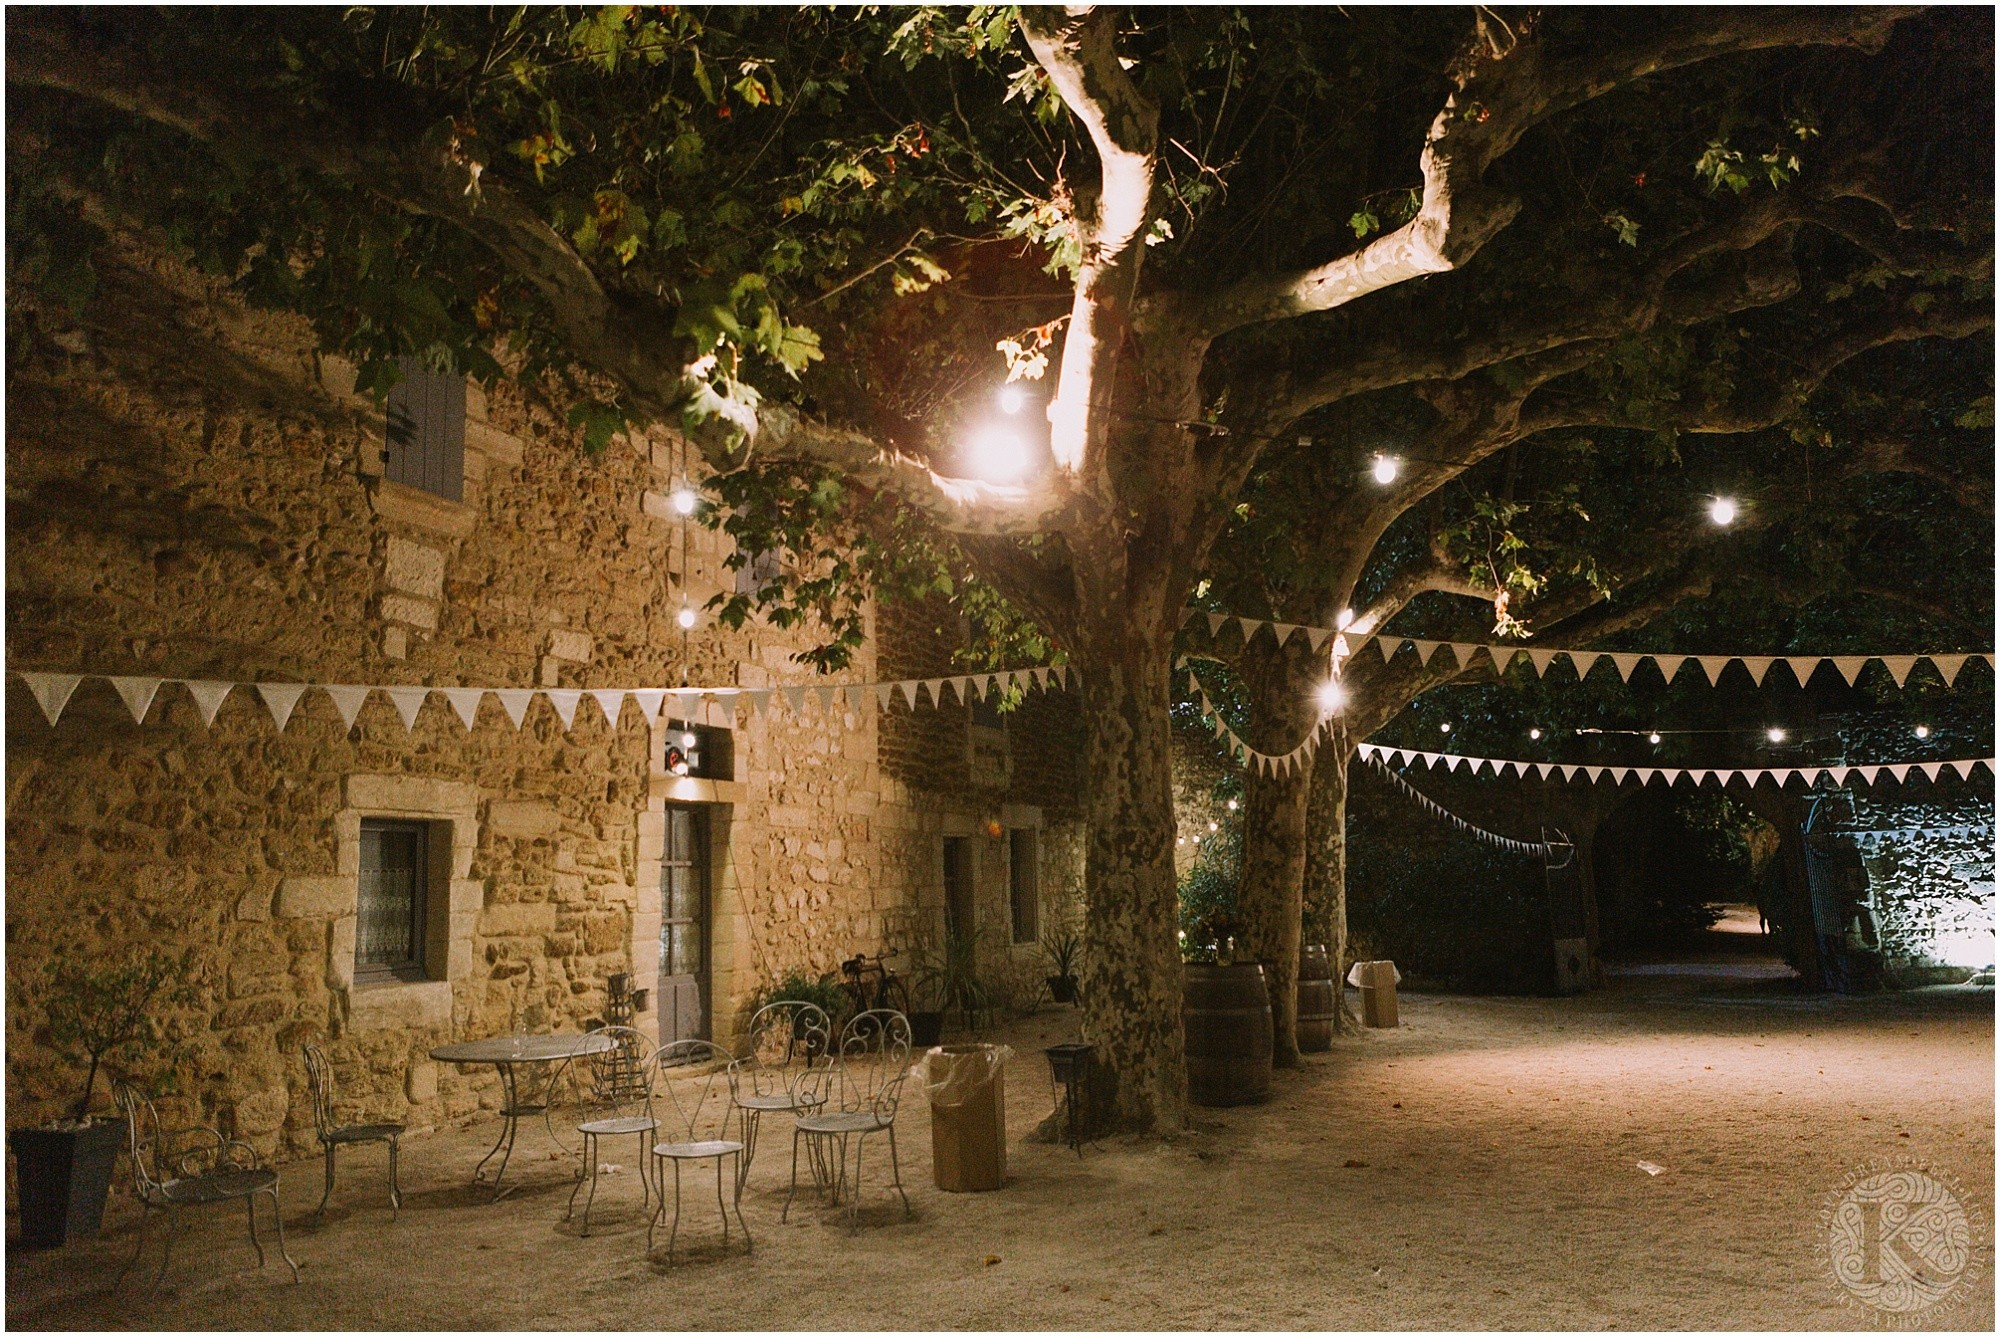 Kateryna-photos-photographe-mariage-vaucluse-provence-avignon-ferme-st-hugues_0102.jpg